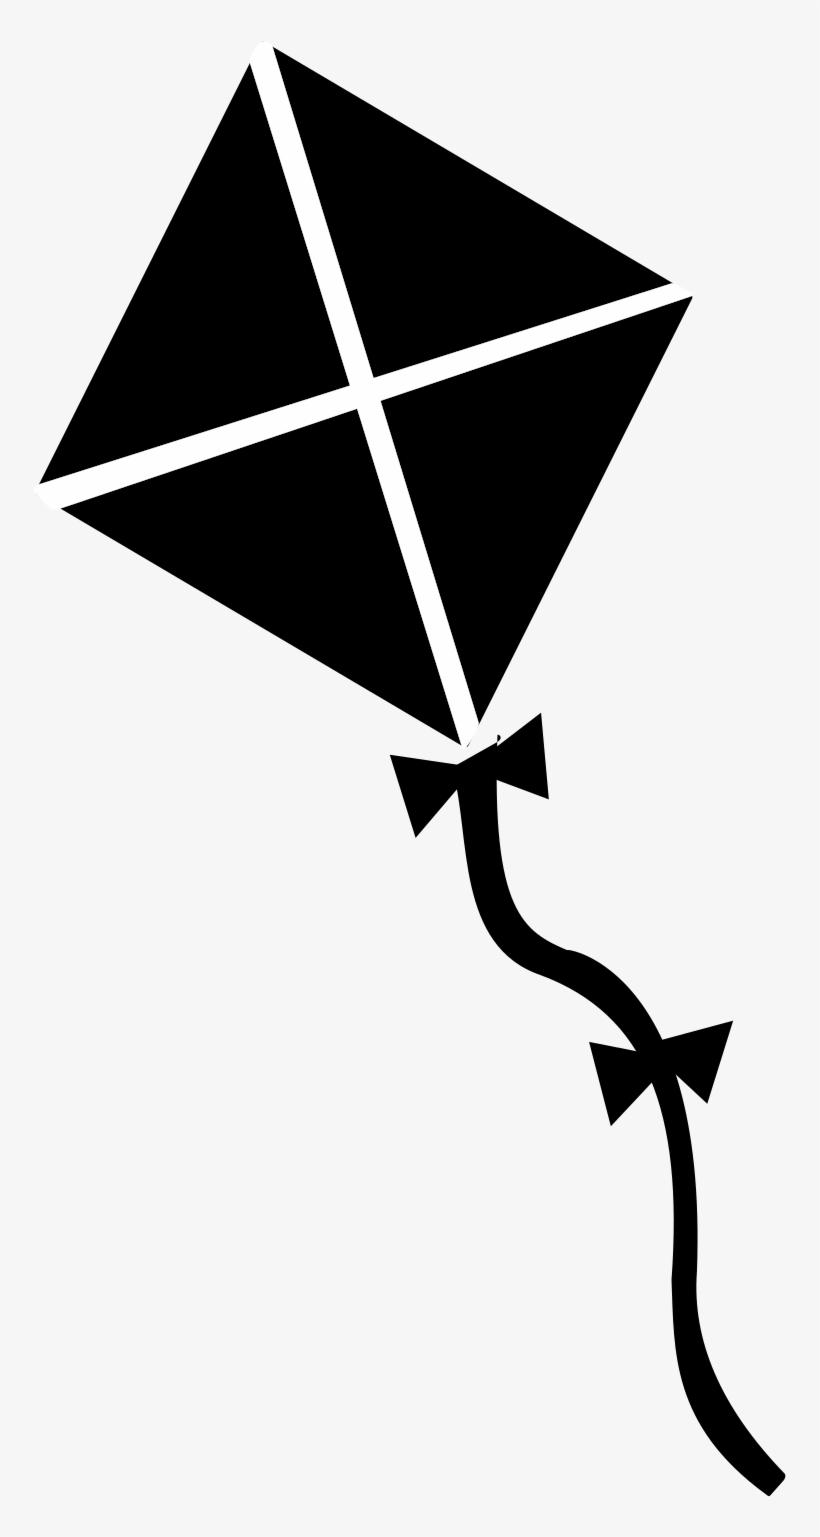 Kite clipart big kite. Black and white image